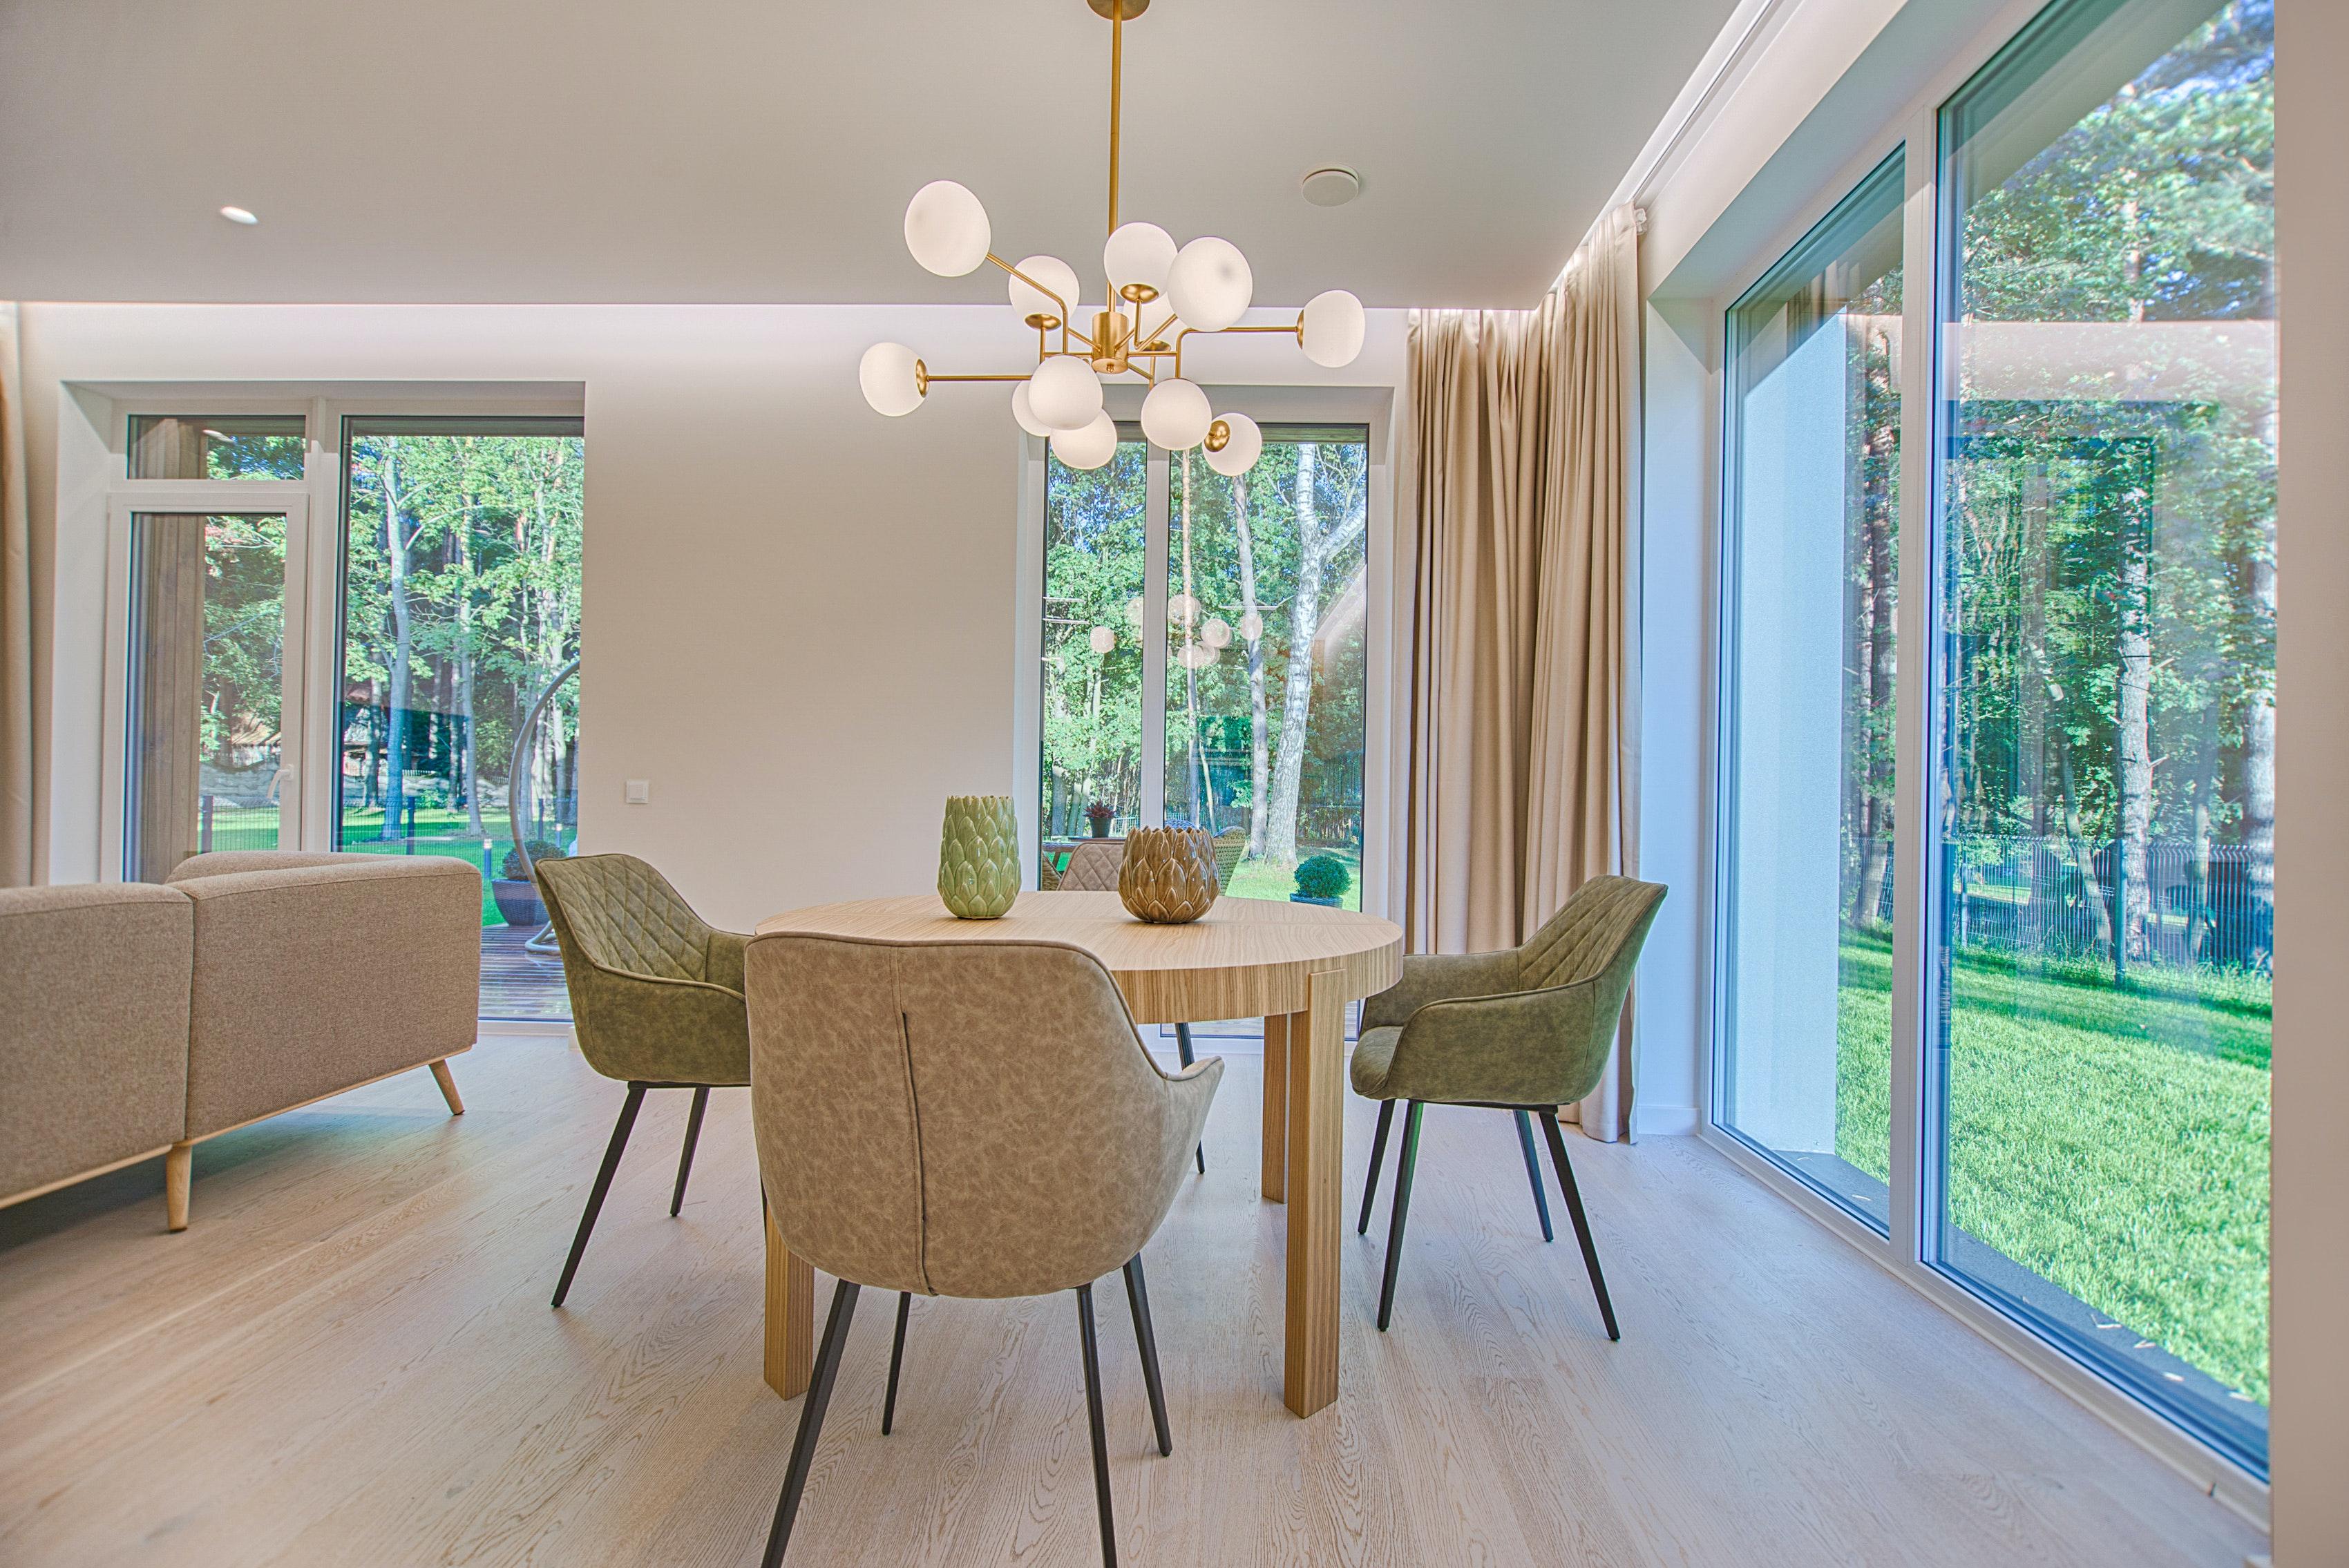 Furniture, Space, Arrangement